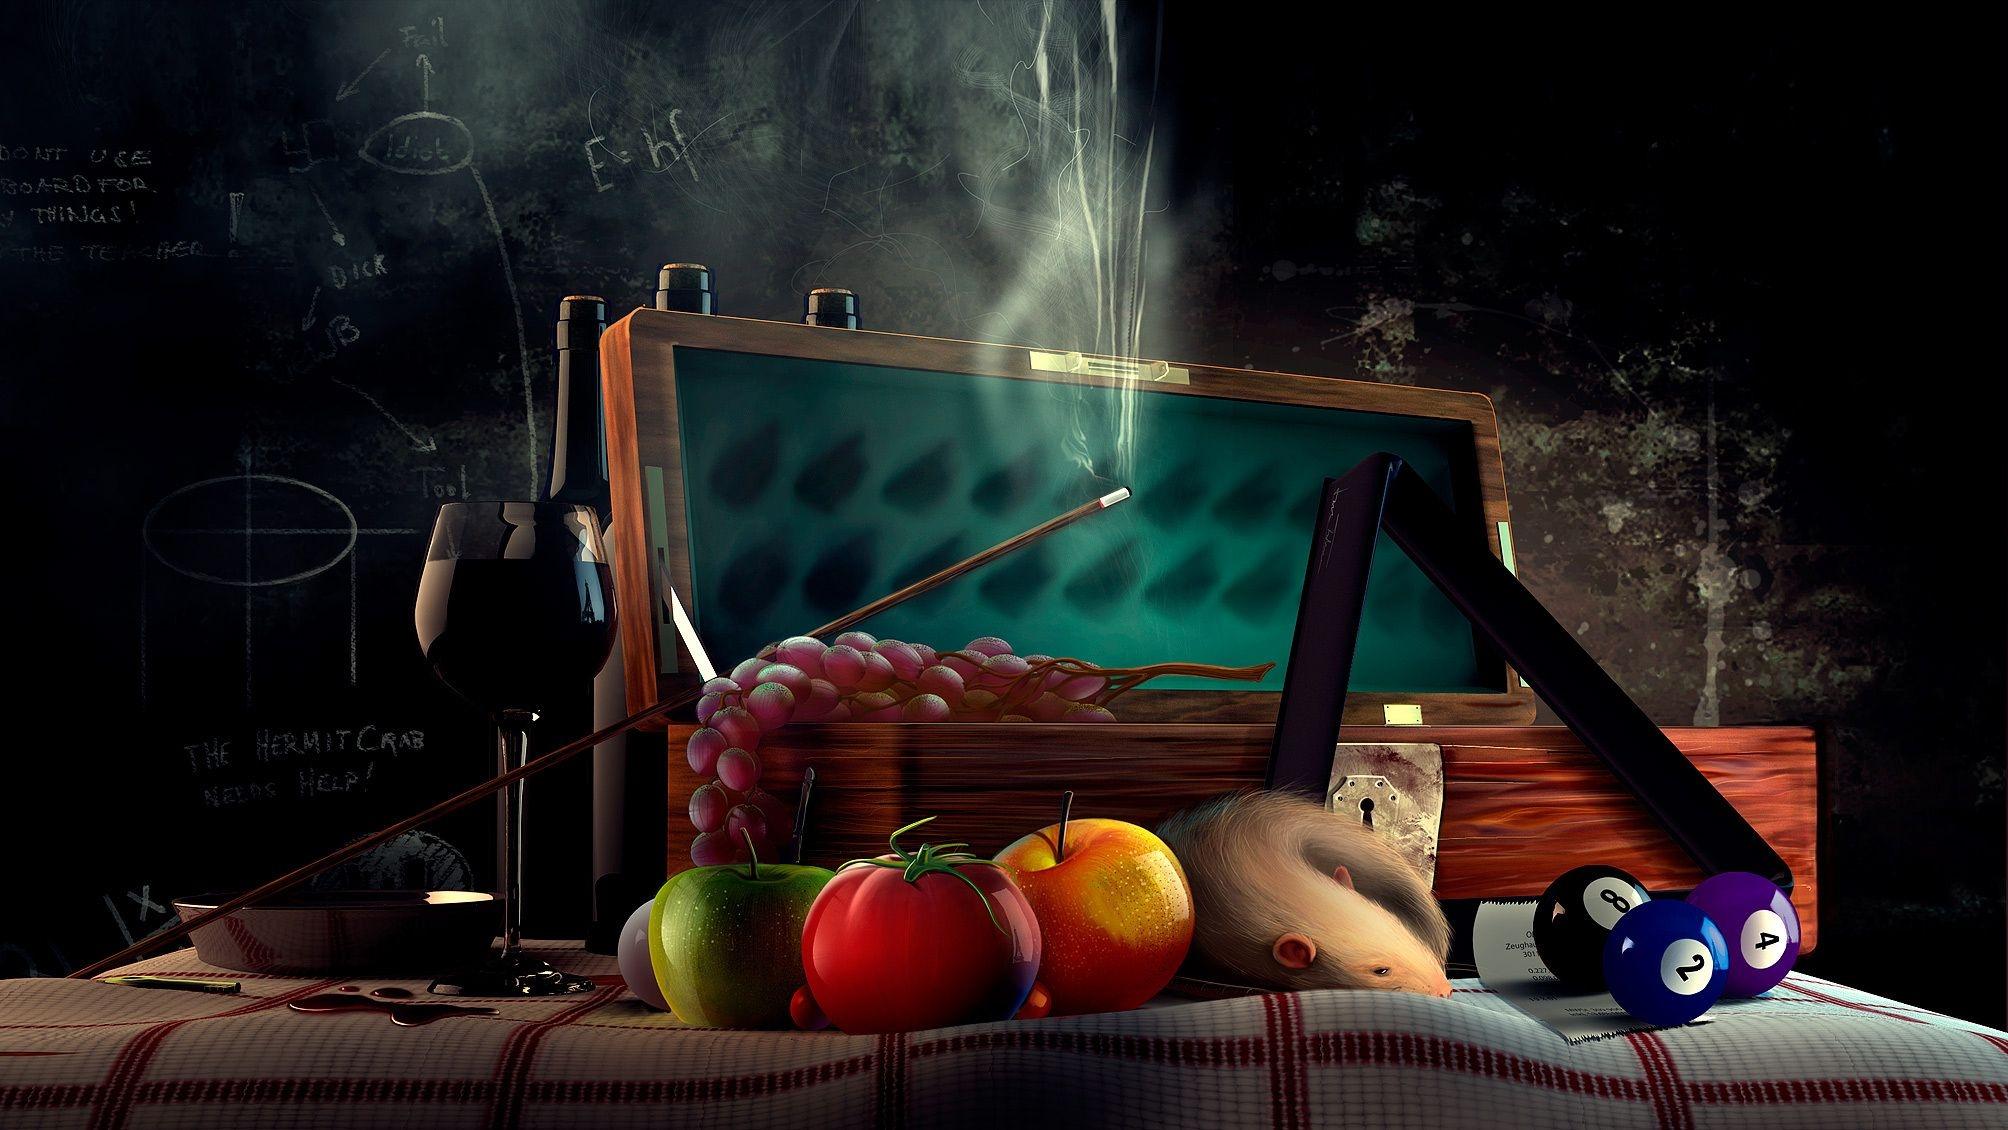 126830 descargar fondo de pantalla 3D, Rata, Un Tomate, Tomate, Vidrio, Señal, Taco, Billar, Junta, Tabla, Pelotas, Bolas, Guirnalda, Corona: protectores de pantalla e imágenes gratis